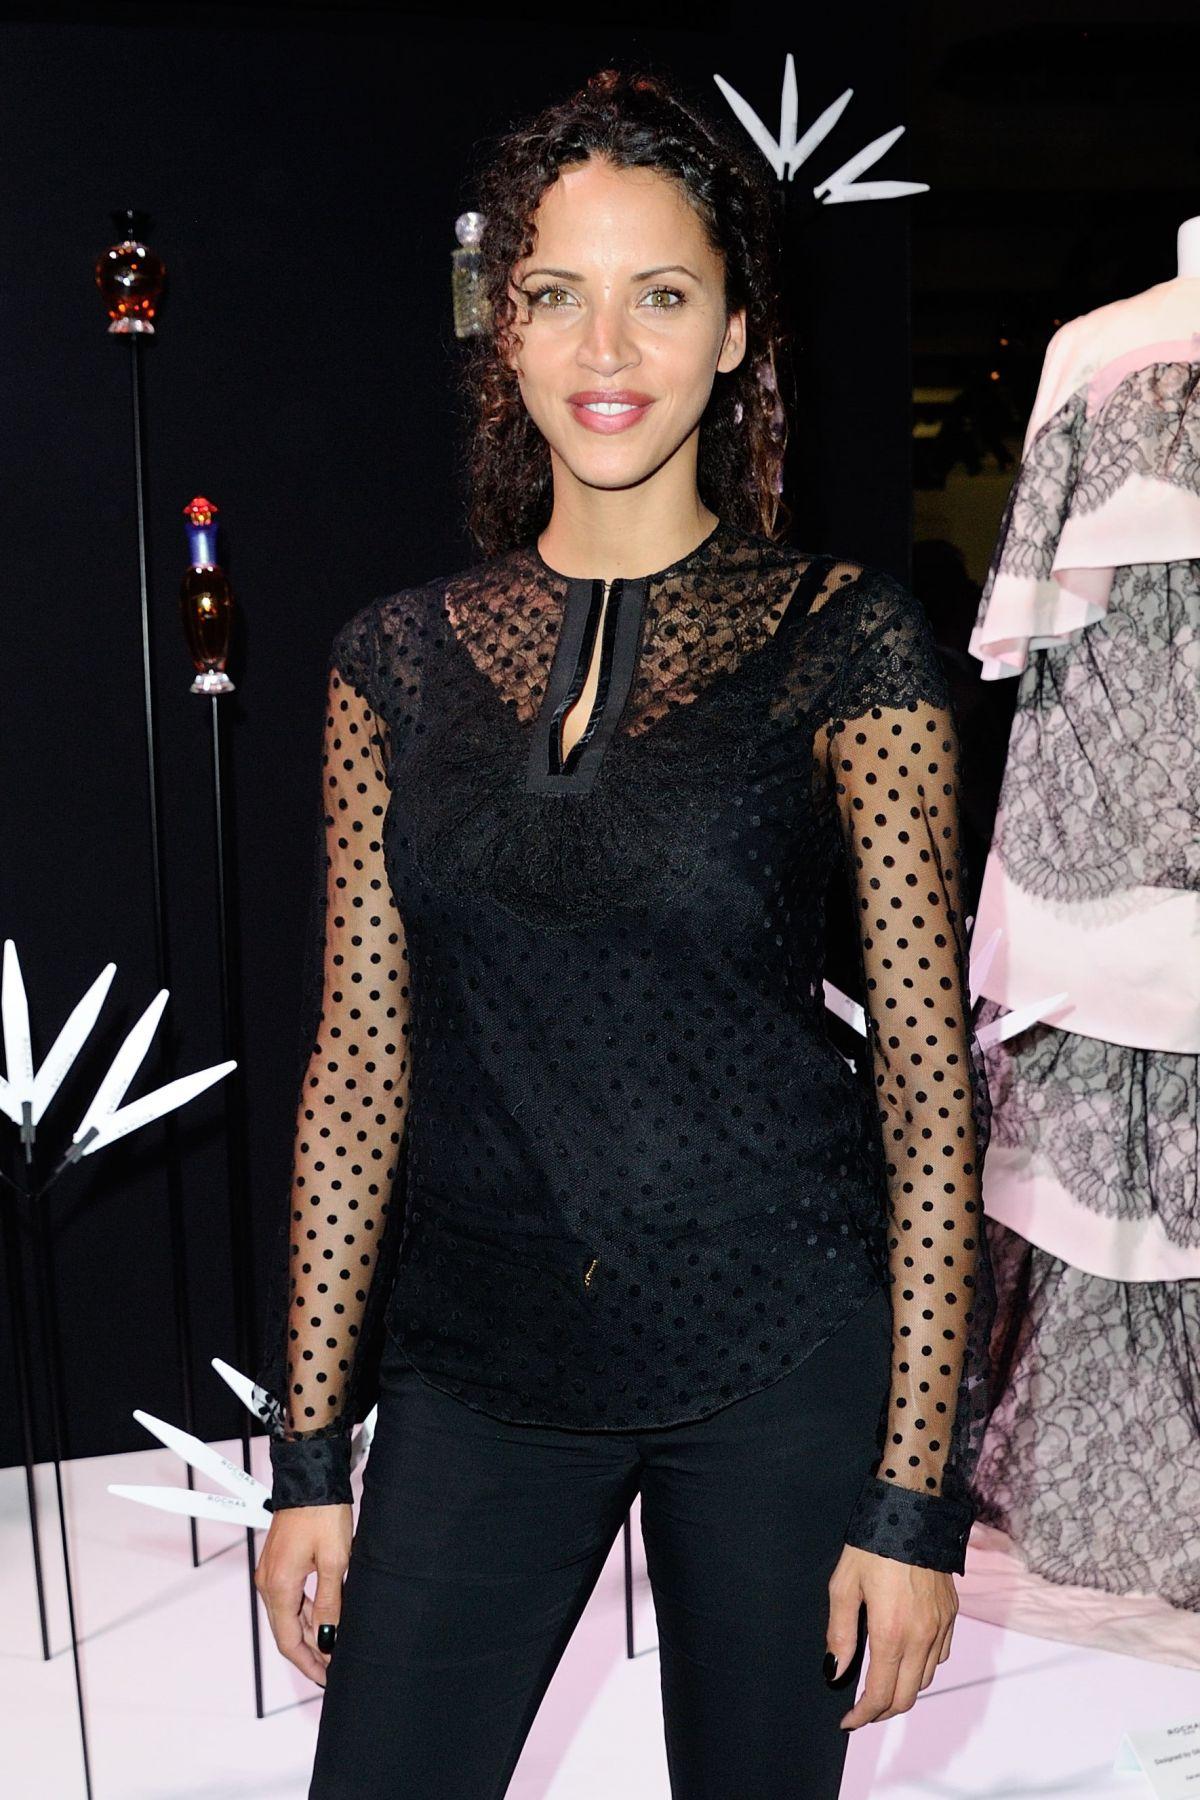 NOEMIE LENOIR at Rochas 90th Anniversary Cocktail in Paris 09/30/2015